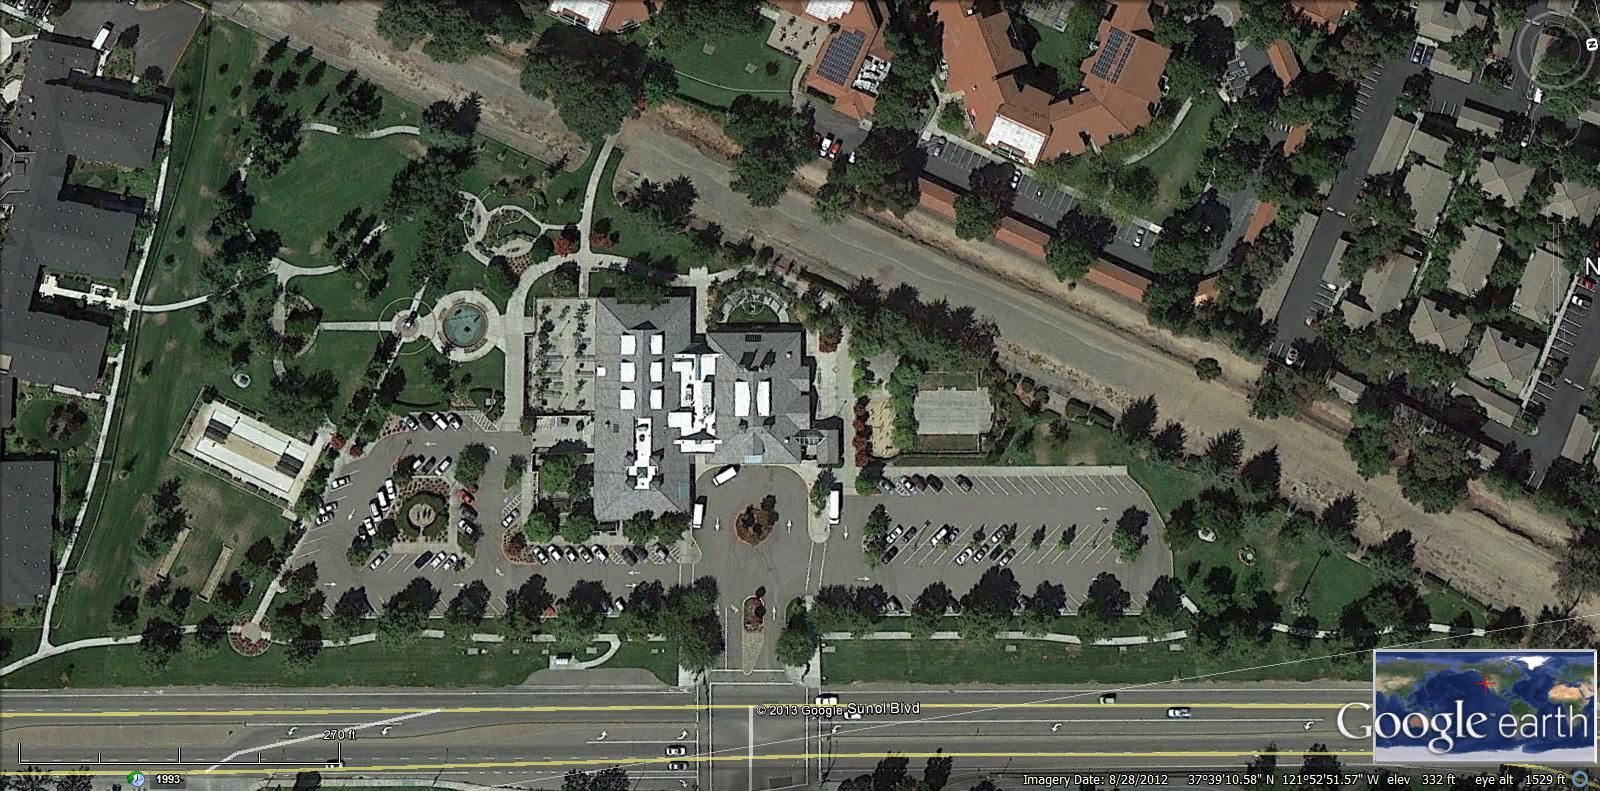 Centennial Park & Senior Center